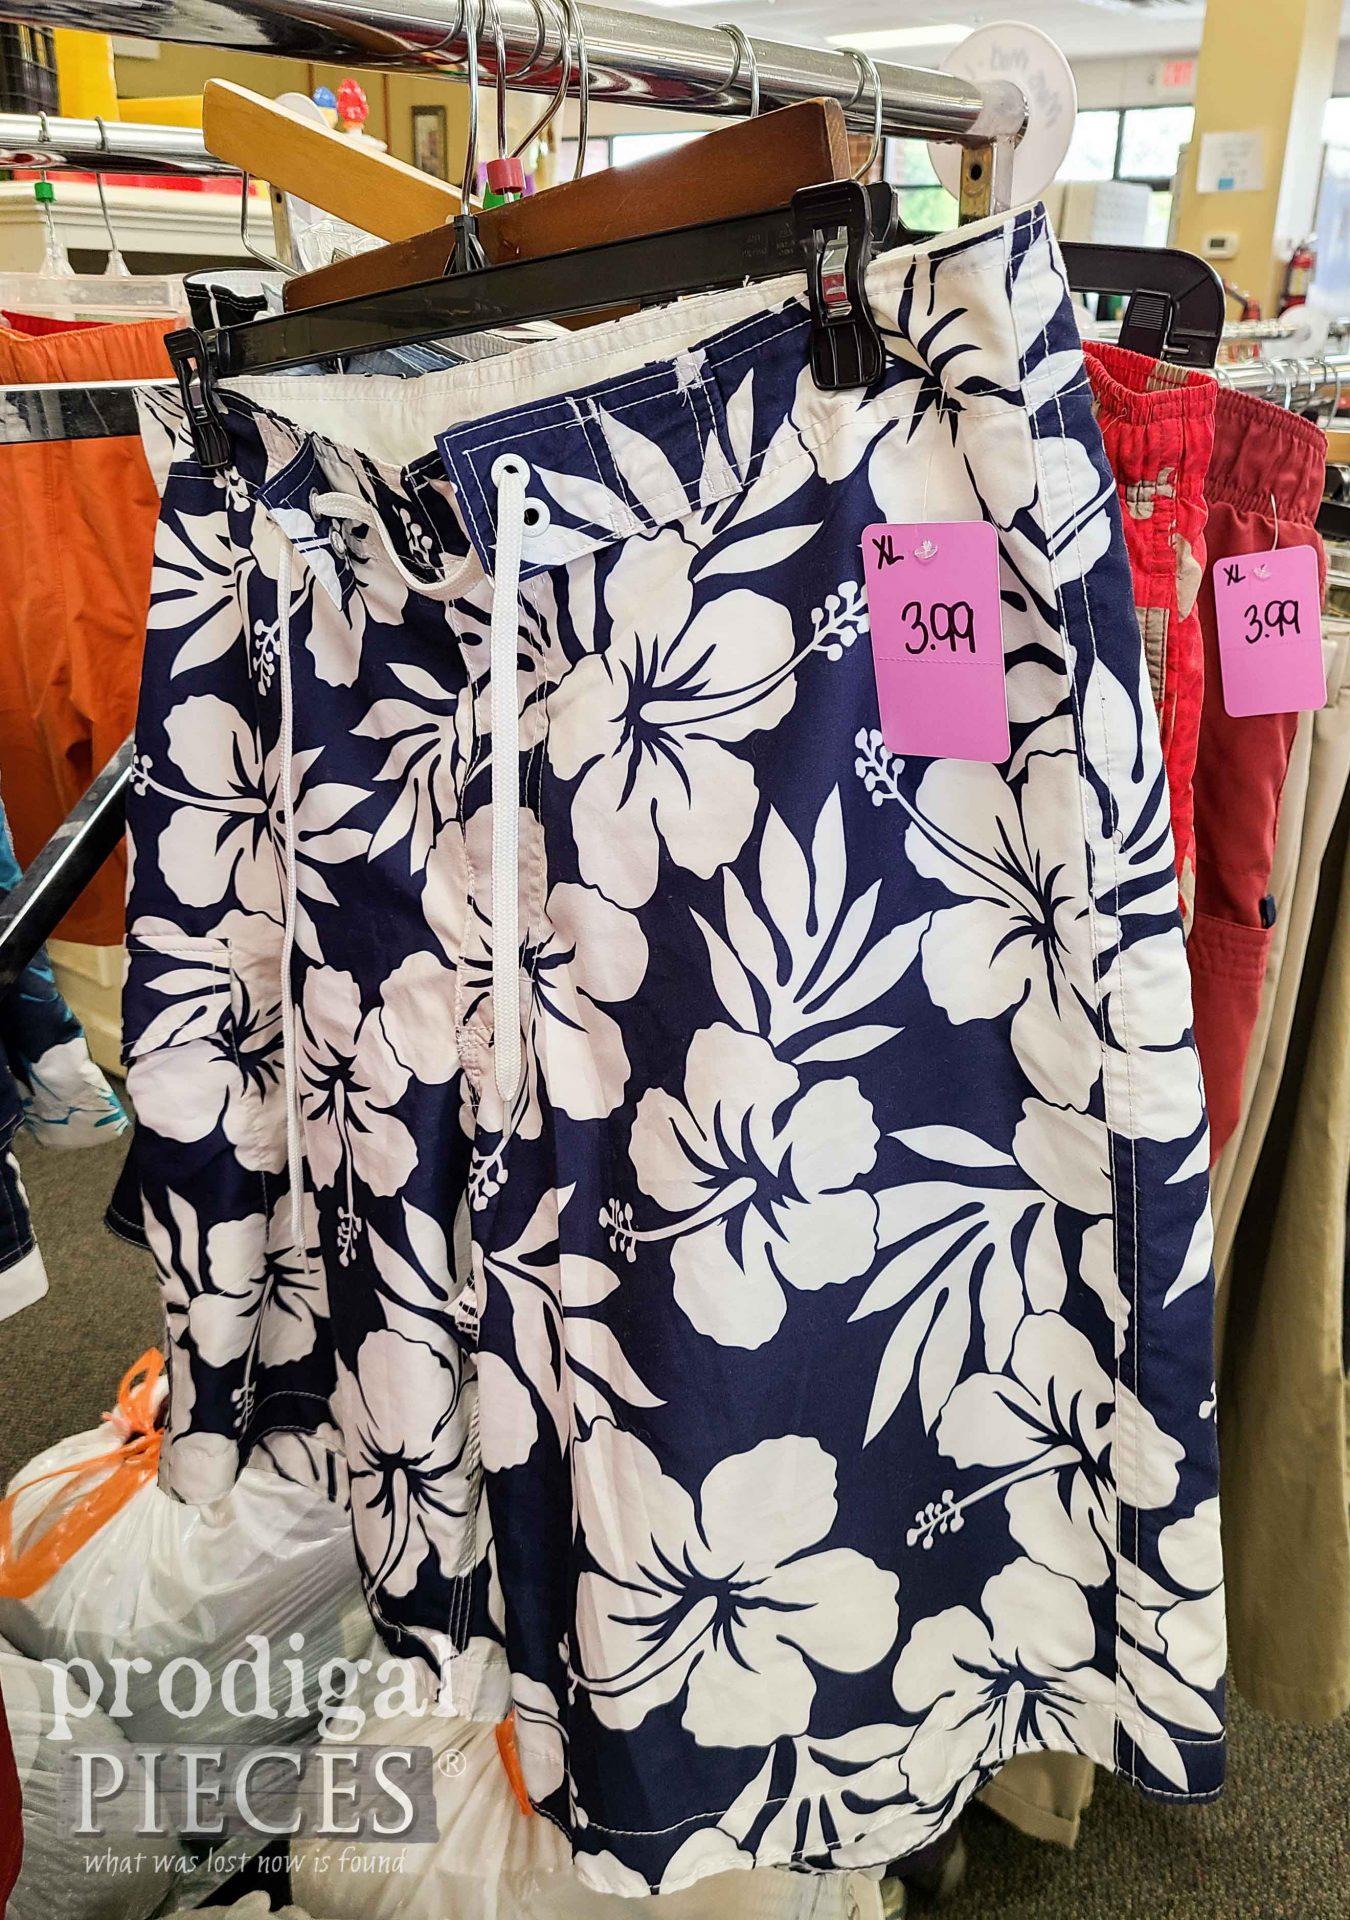 Thrift Store Swim Trunks Before Refashion   prodigalpieces.com